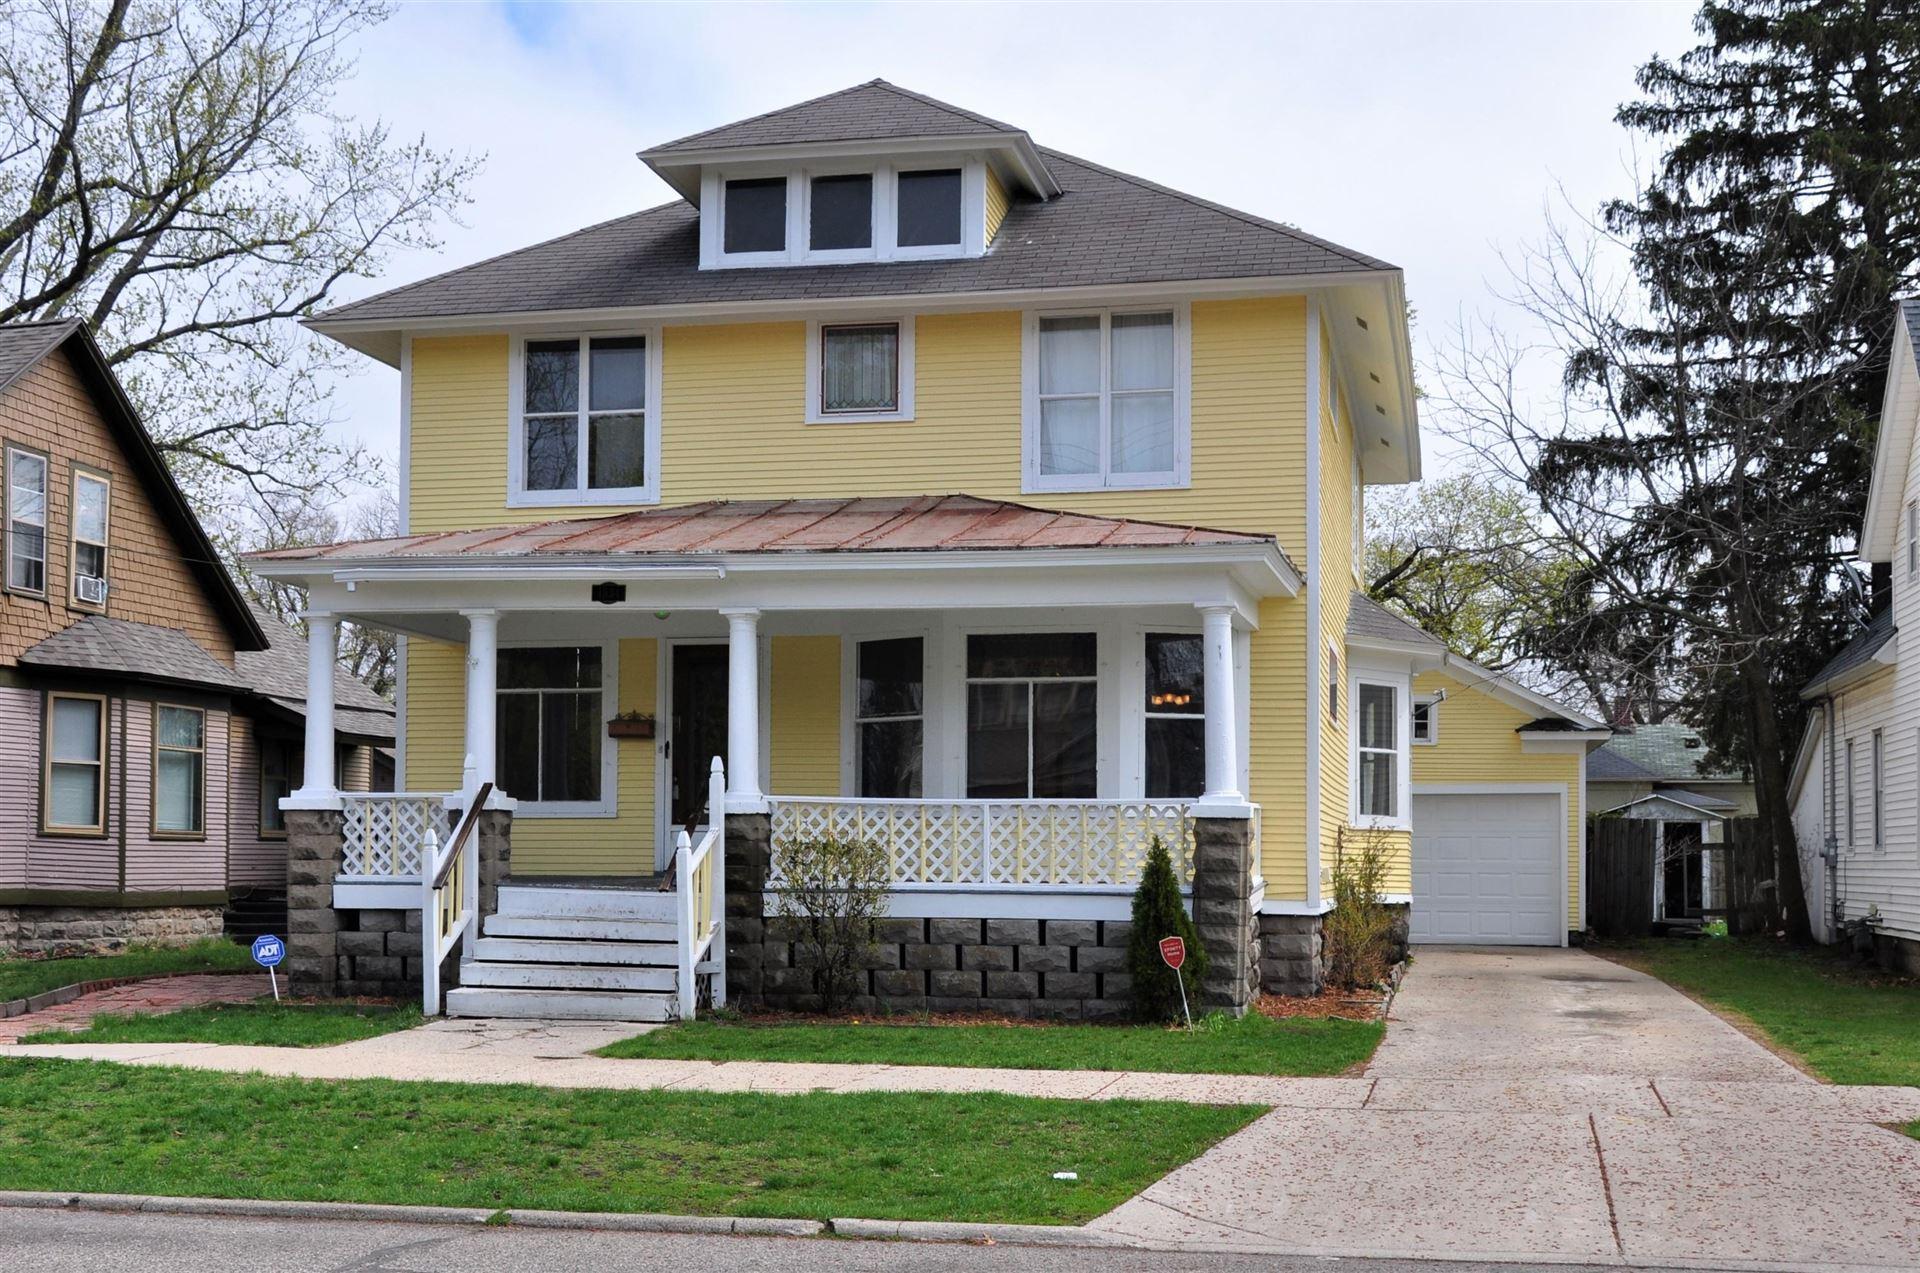 1534 Clinton Street, Muskegon, MI 49442 - MLS#: 21011936